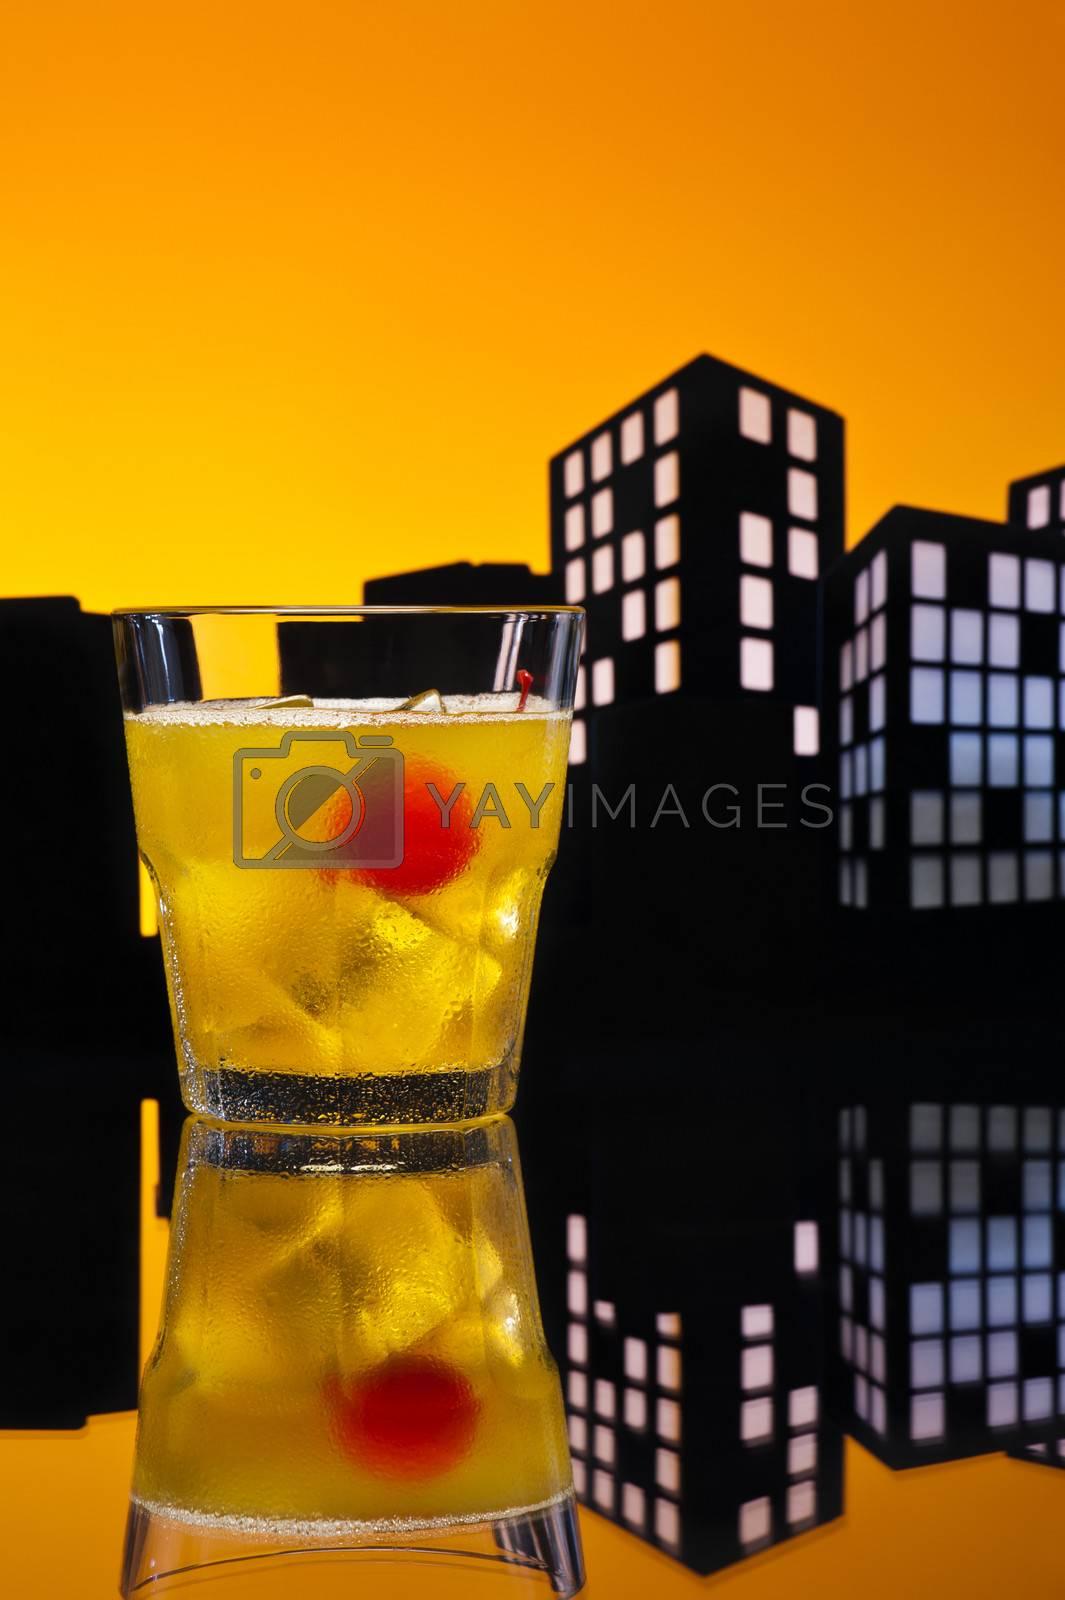 Skrew Driver cocktail in city skyline setting